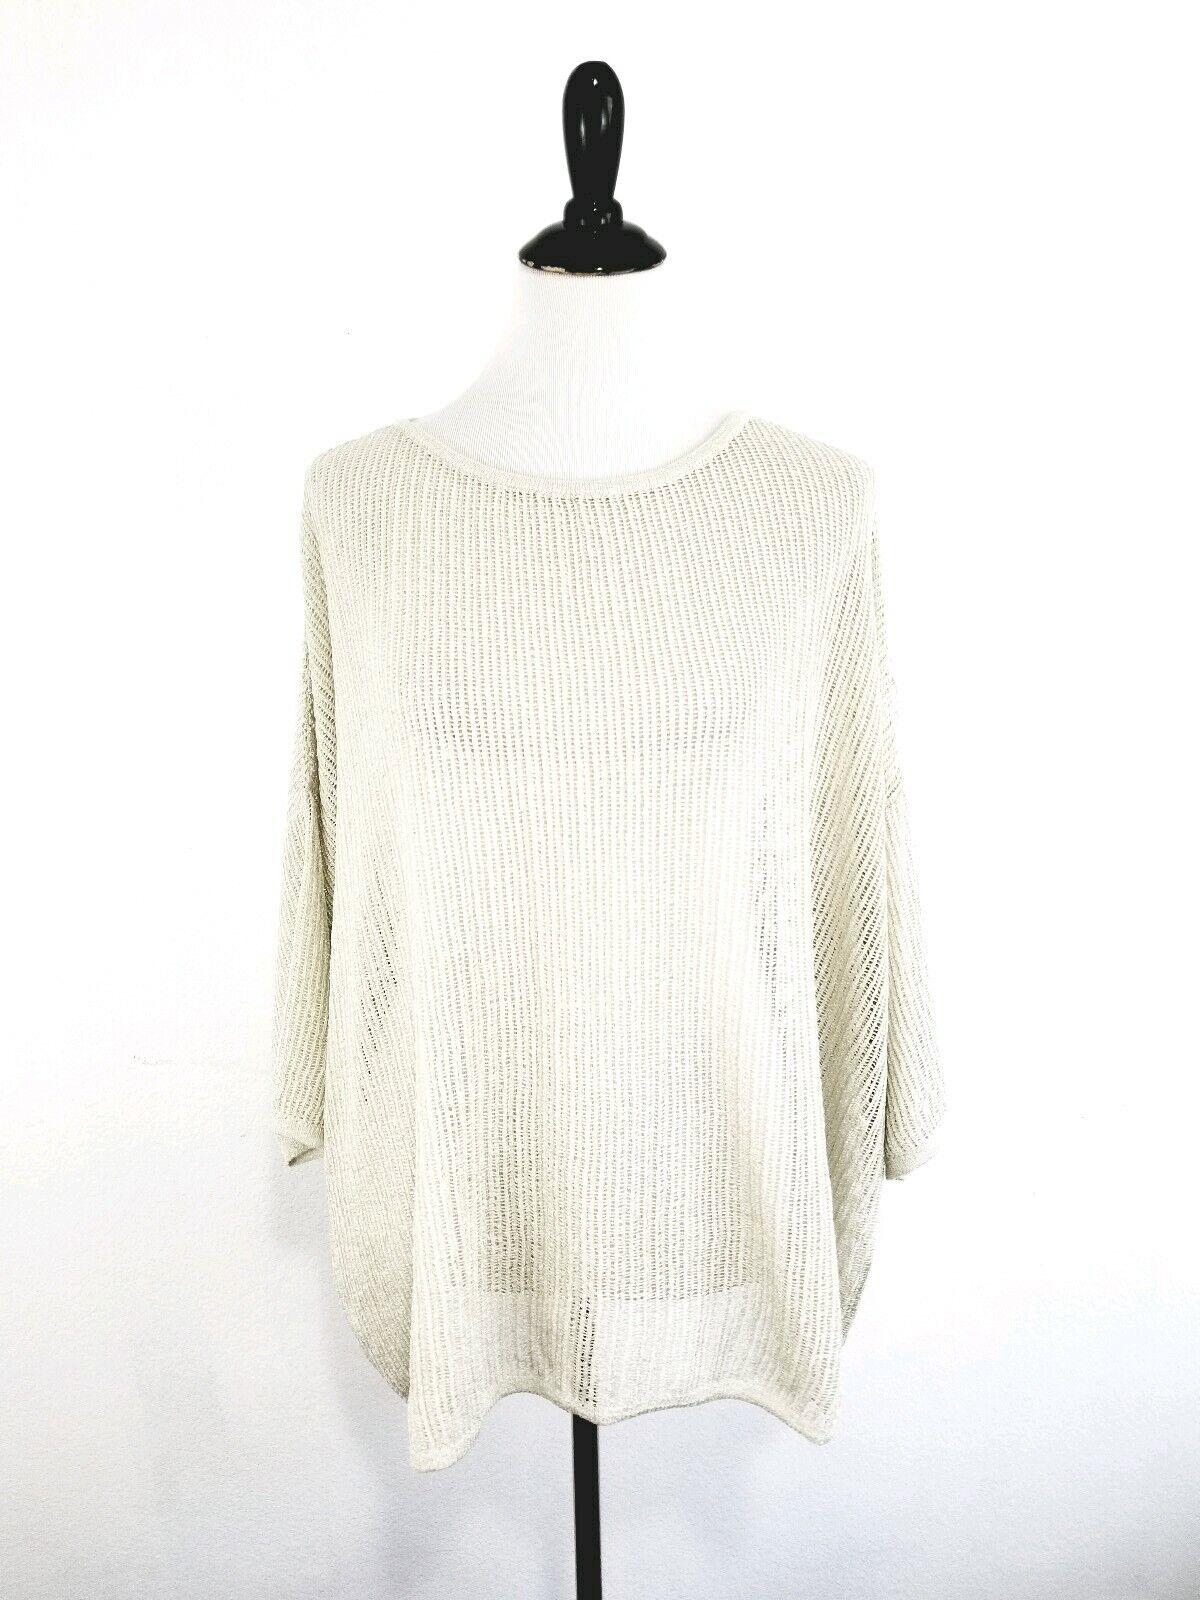 M MISSONI Women's Popover Oversized Metallic Open Knit Sweater Ivory Size Medium